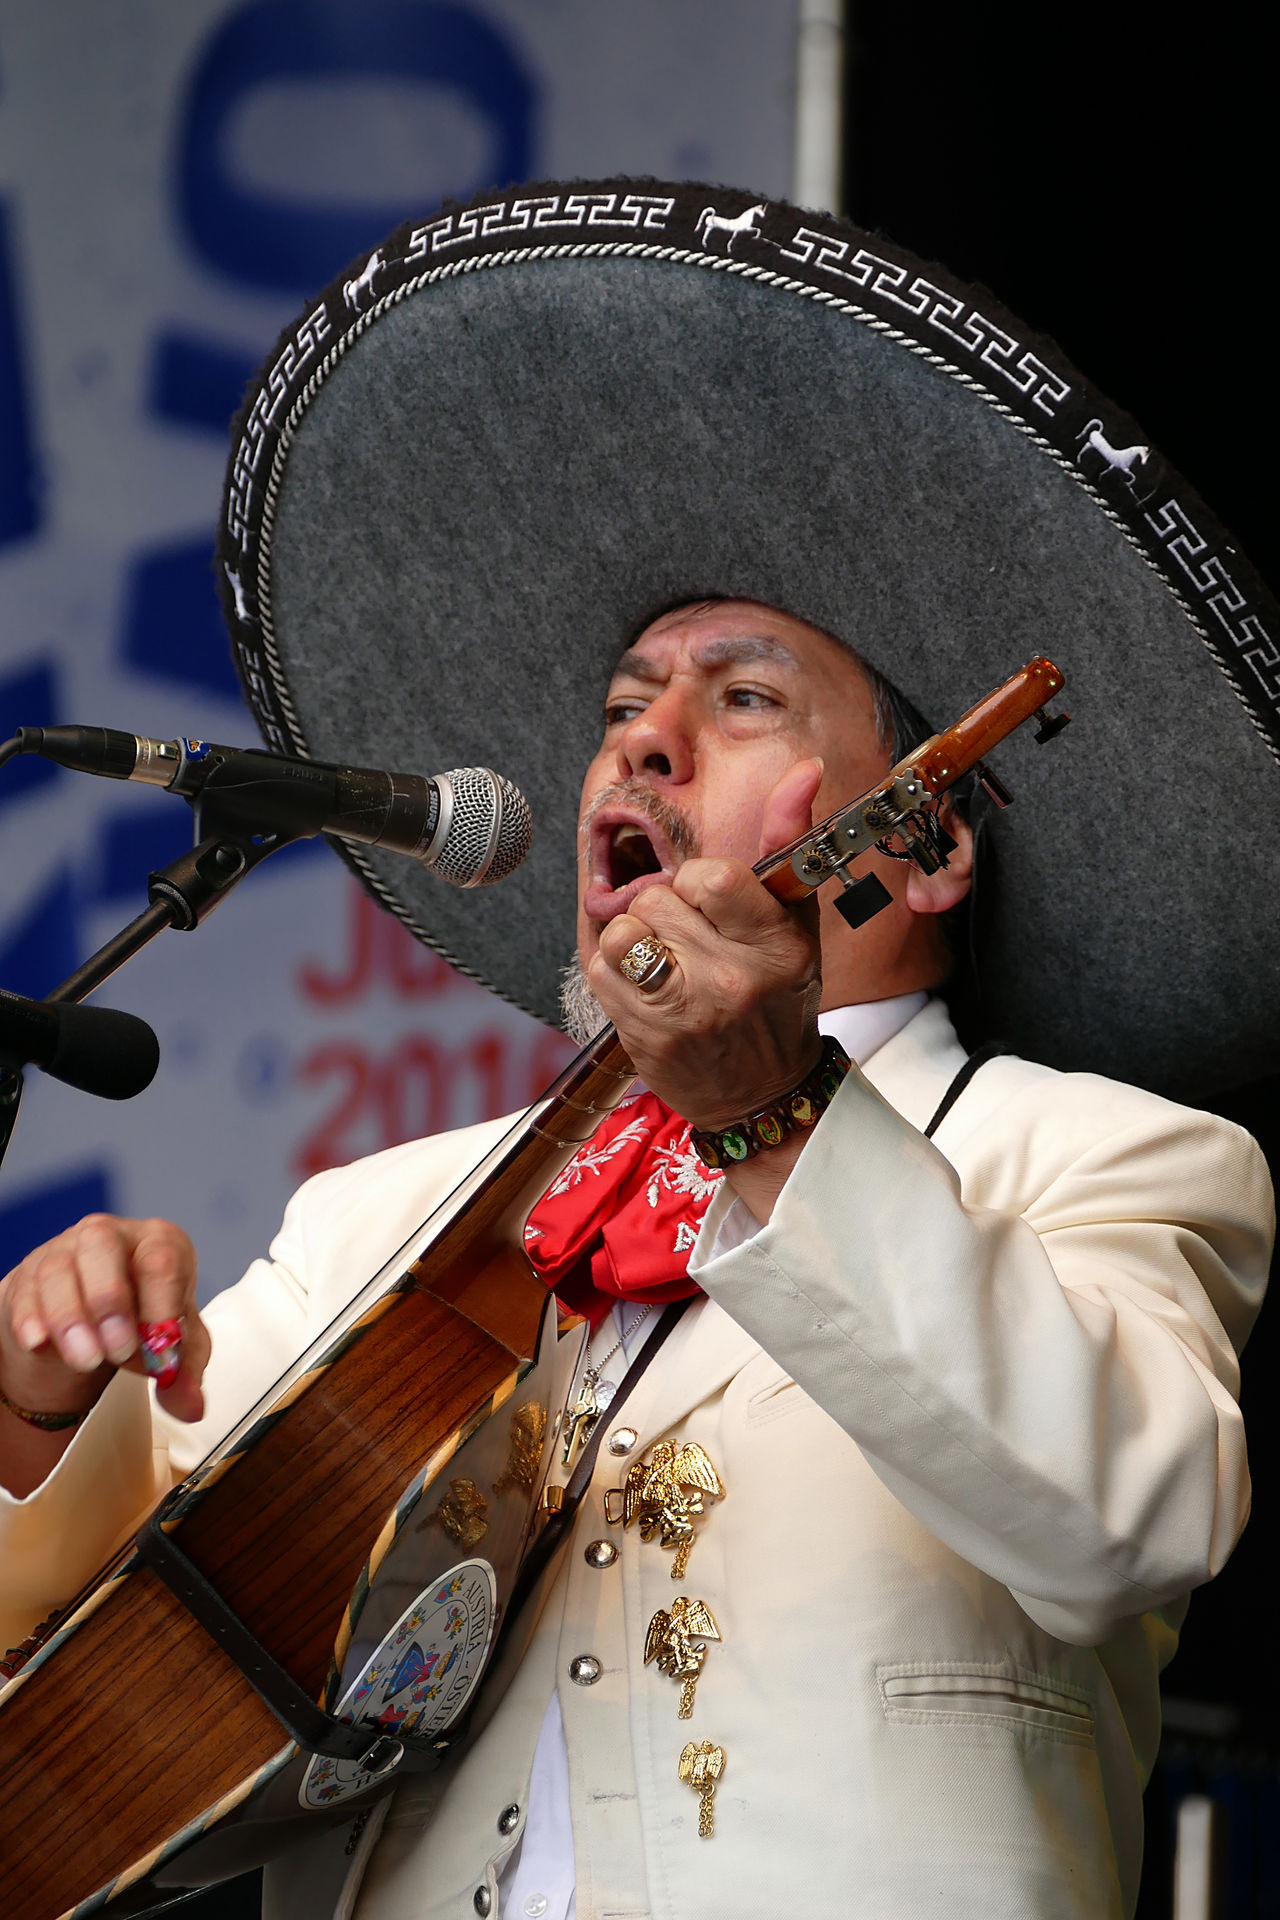 Feier Festival Front View Kielerwoche Mexican Music Person Songs Summer